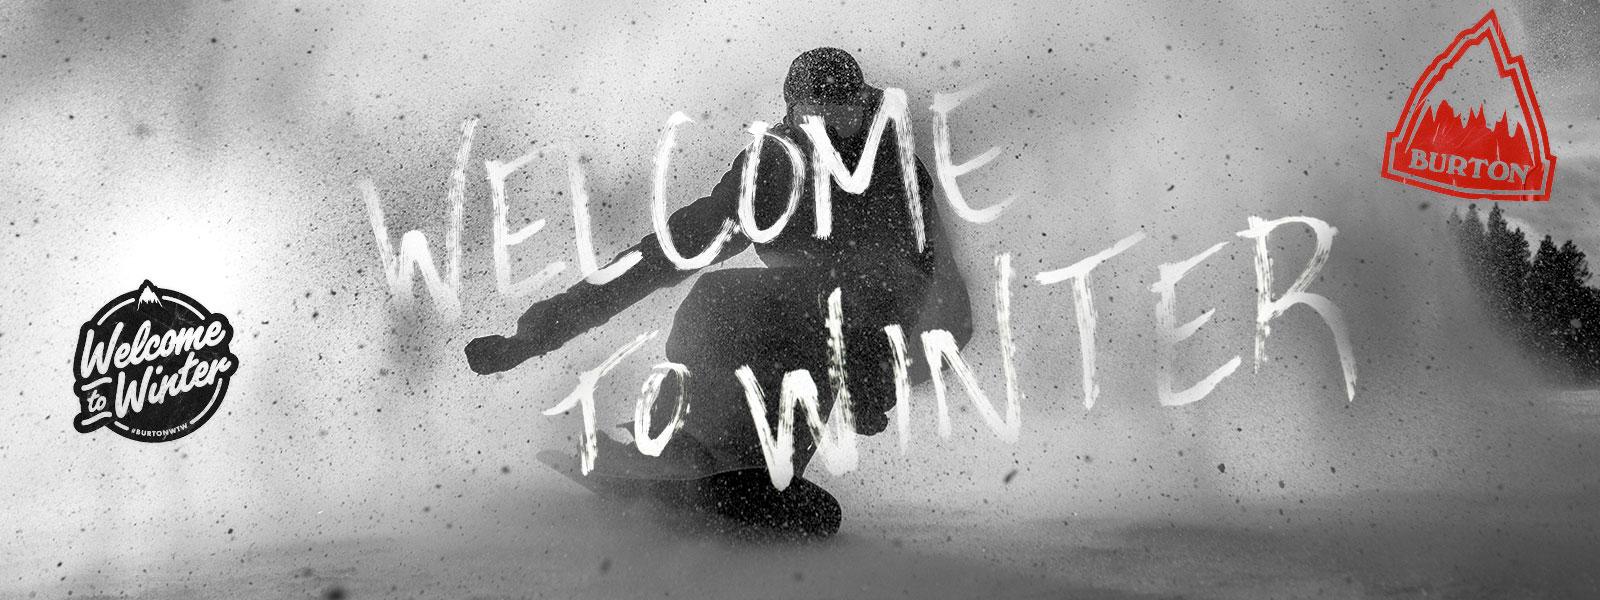 WelcomeToWinter_Homepage_Desktop.jpg